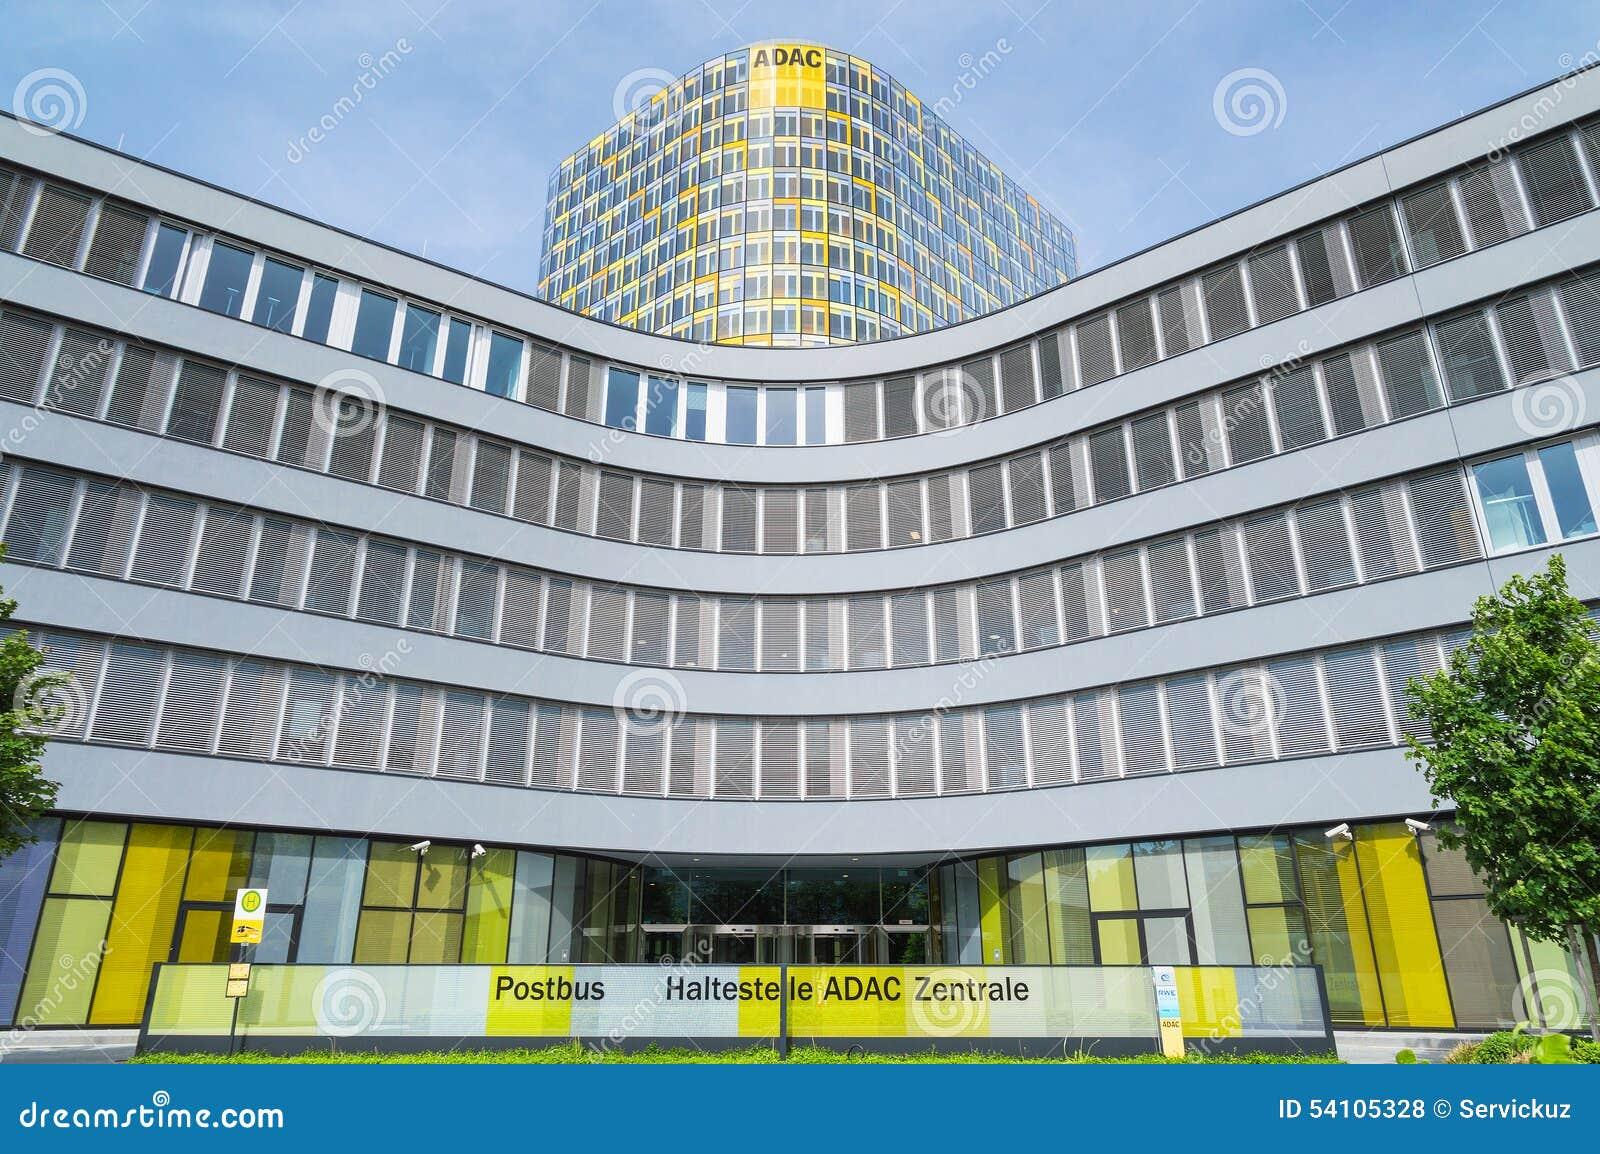 ADAC Association European Automobile Club In Germany Editorial Stock